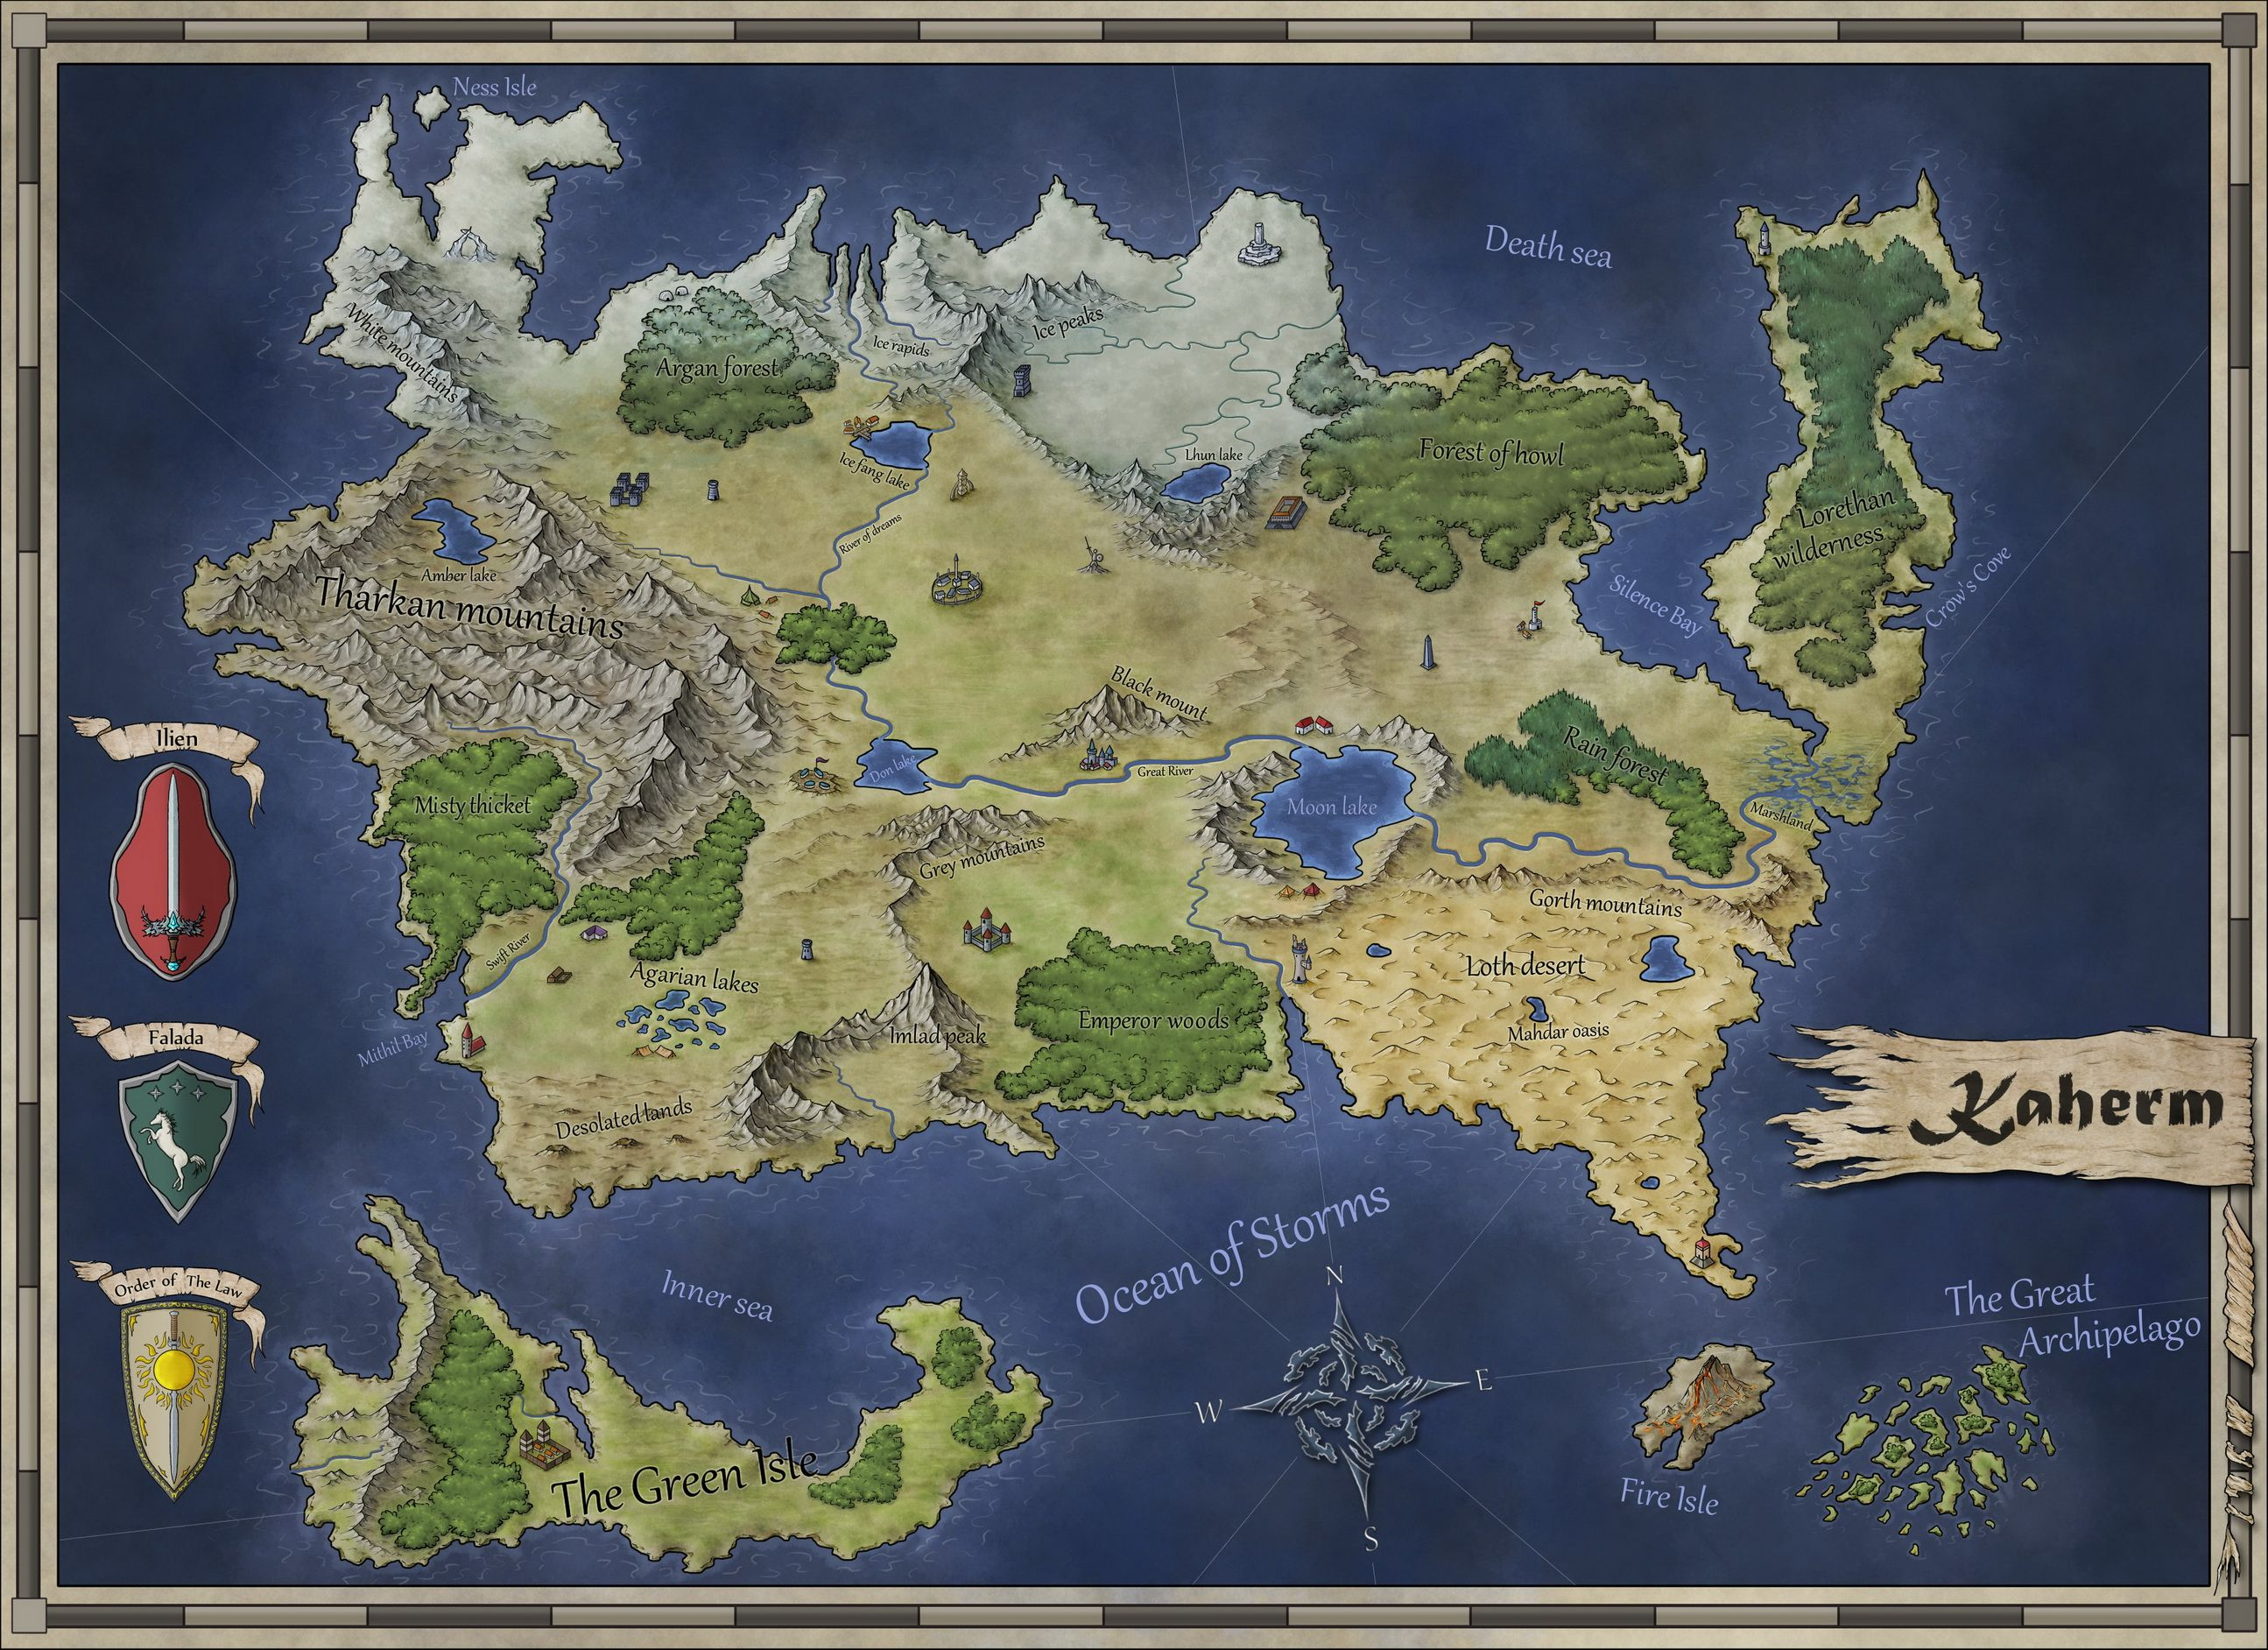 map of kaherm a